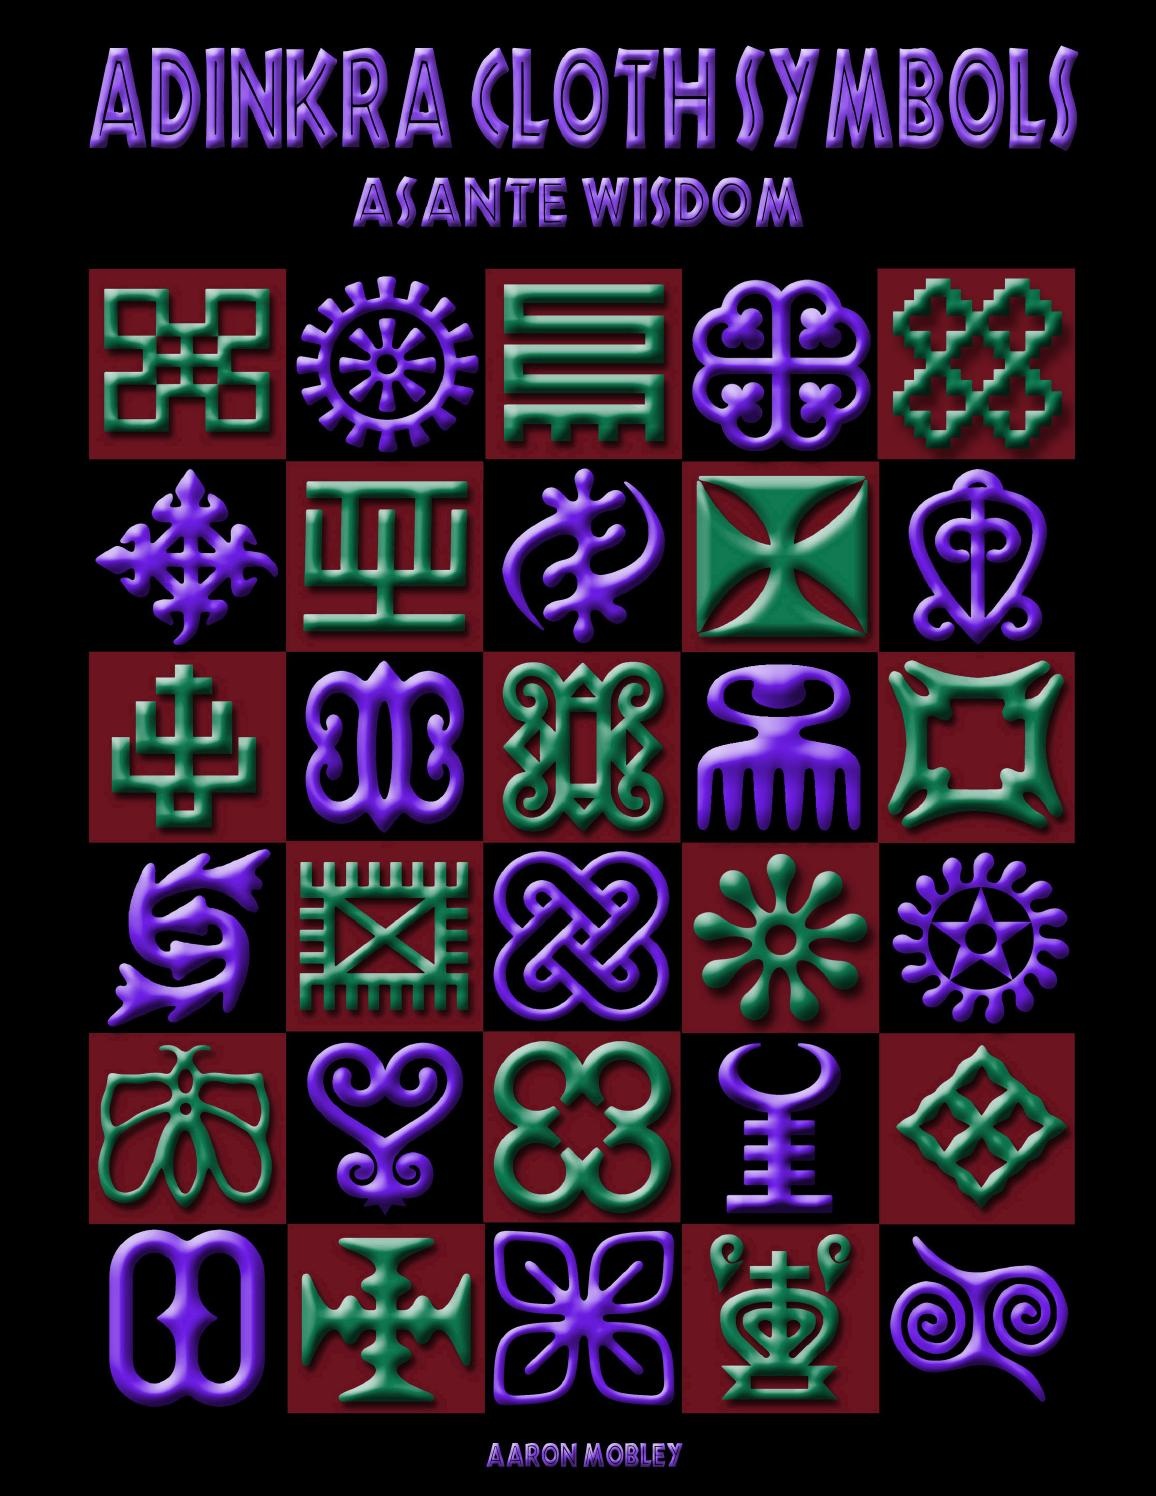 Adinkra cloth symbols asante wisdom by aaron mobley issuu buycottarizona Gallery